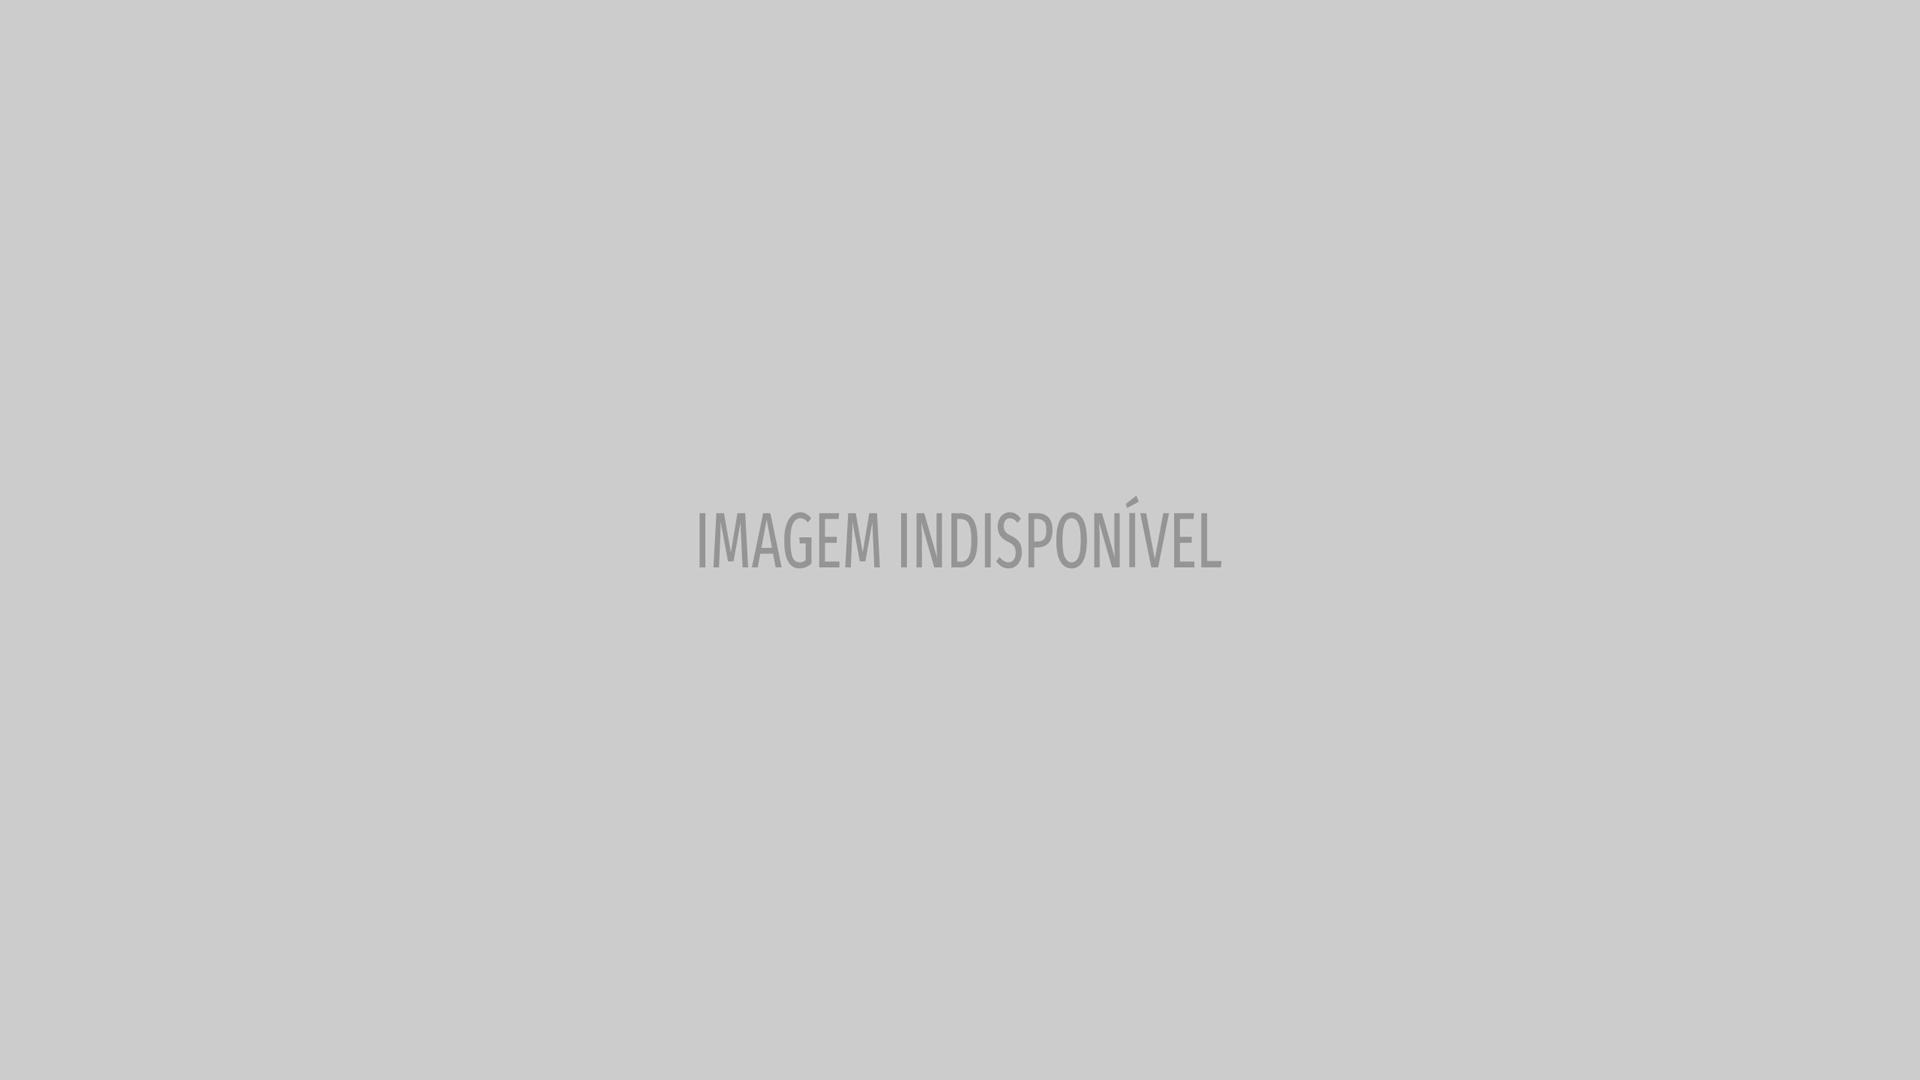 Princesa Eugenie: Saiba onde pode ver o segundo casamento real do ano